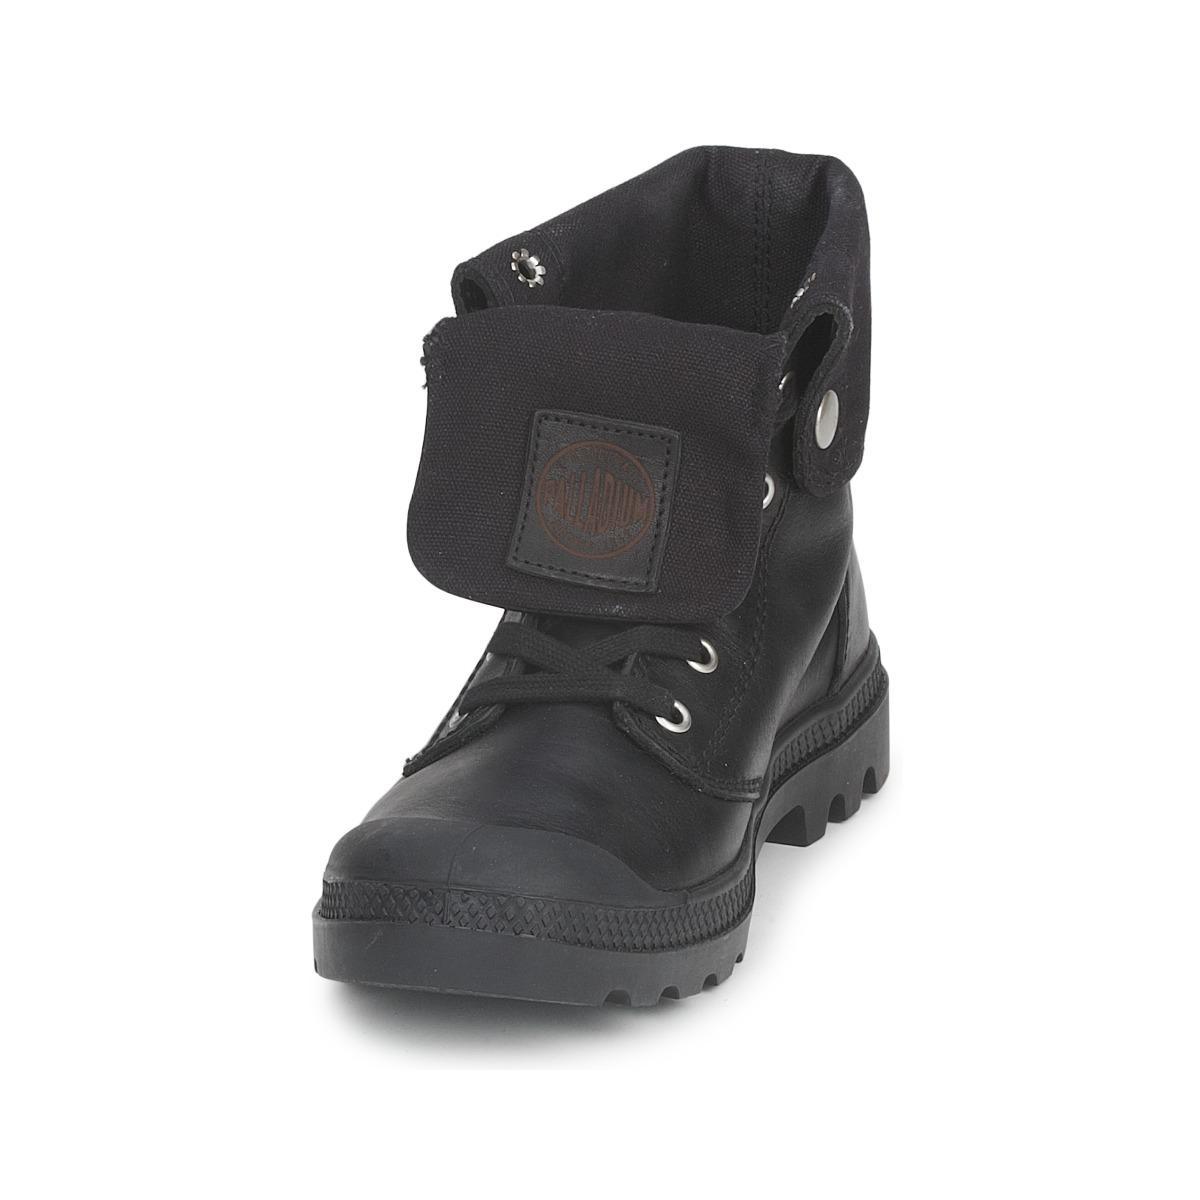 Palladium Leather BAGGY Premium Mid Boots in Black